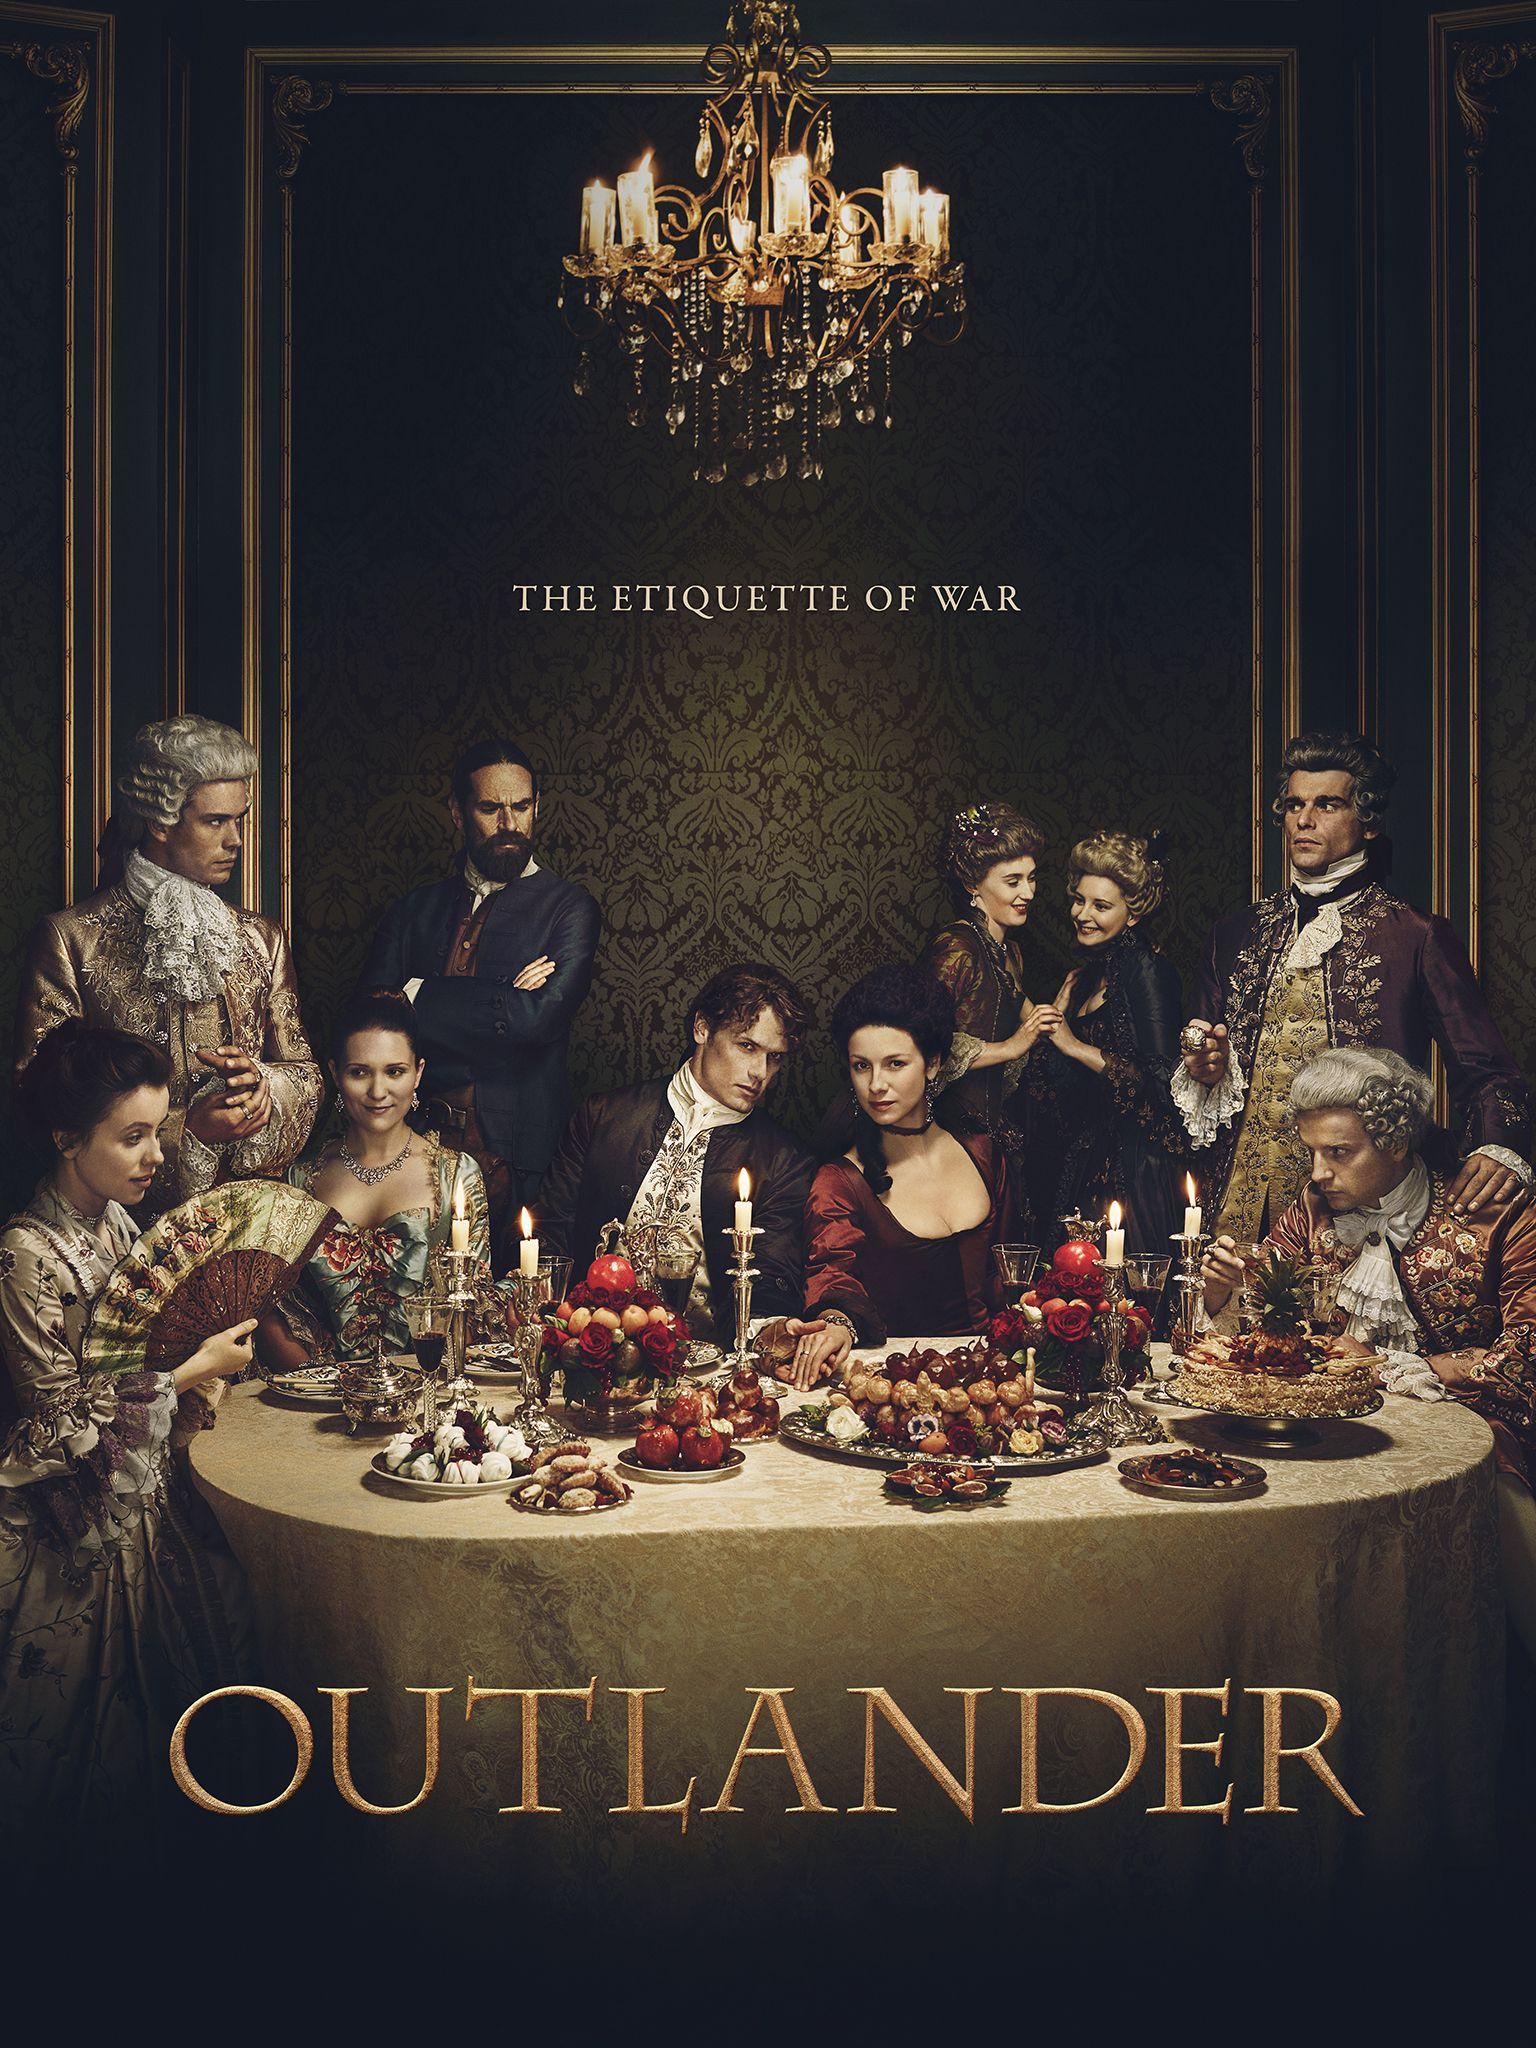 Outlander Outlander Tv Series Outlander Season 2 Outlander Tv